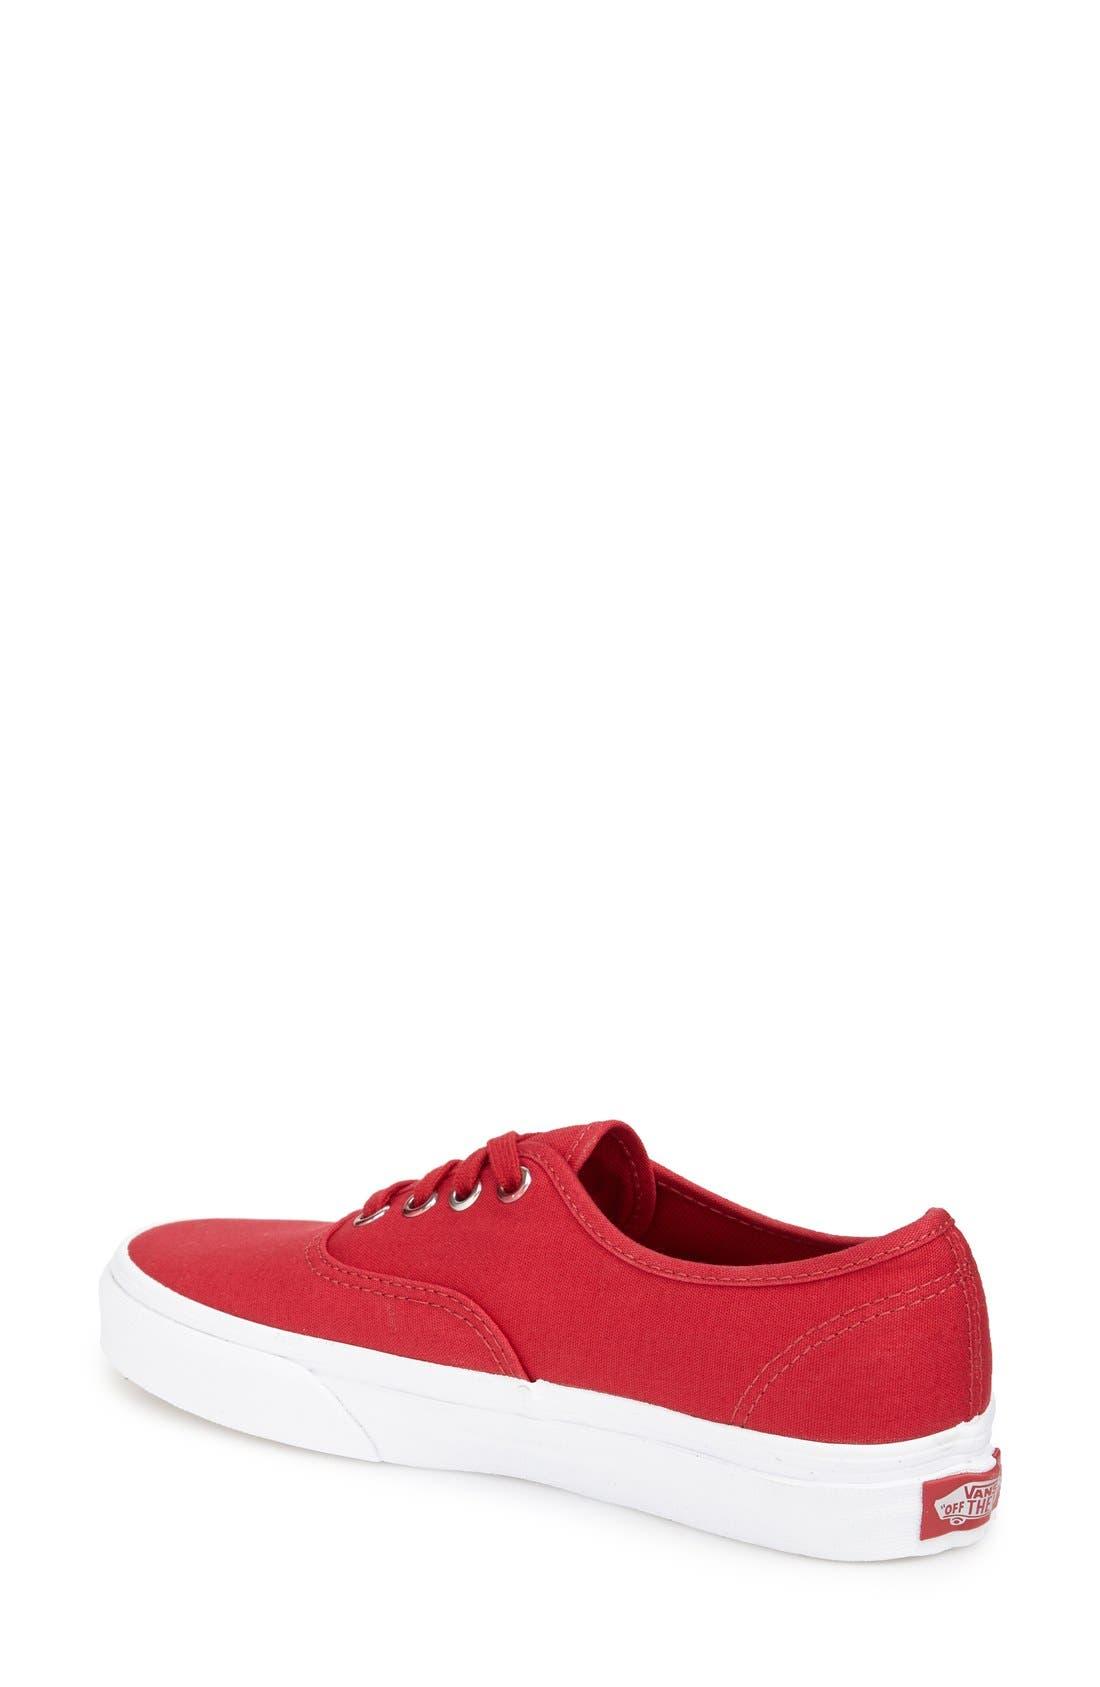 ,                             'Authentic' Sneaker,                             Alternate thumbnail 554, color,                             021